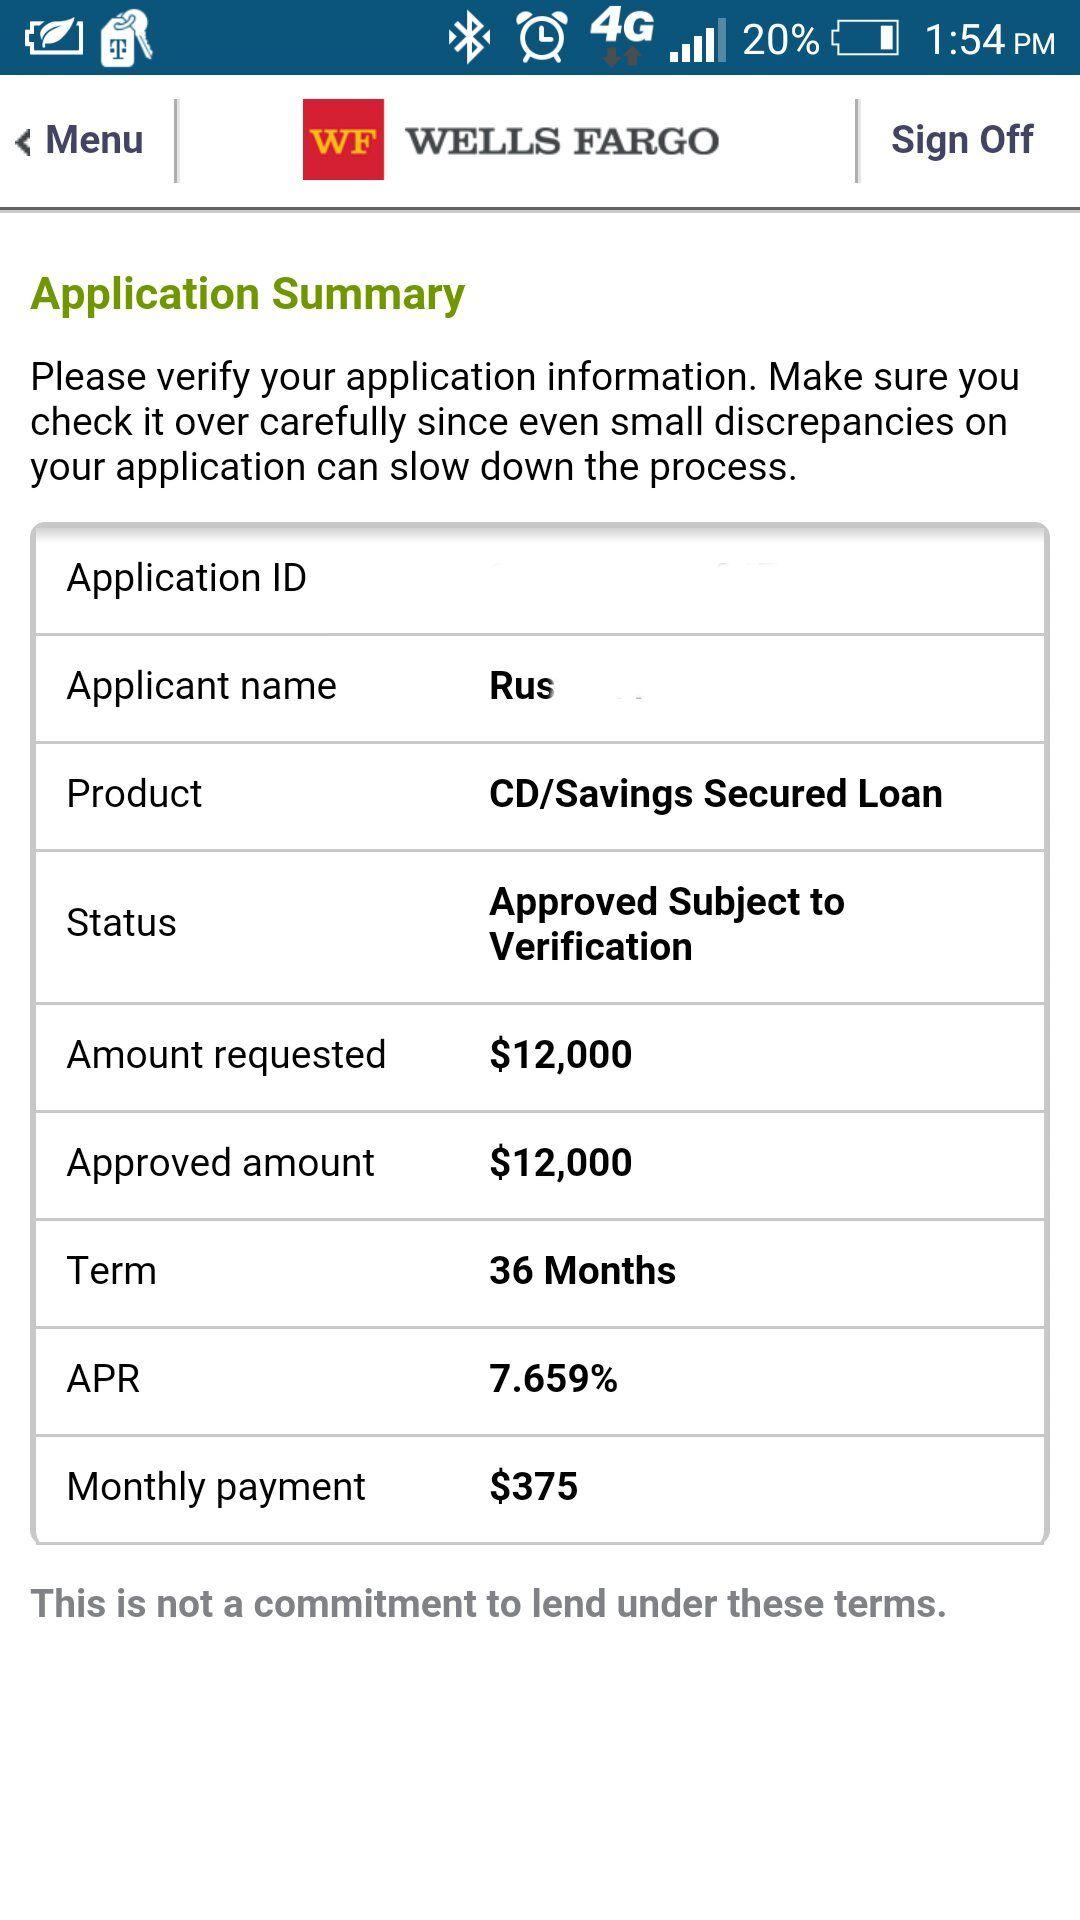 Wells Fargo Payday Loan >> Wells Fargo Personal Loan Credit Requirements